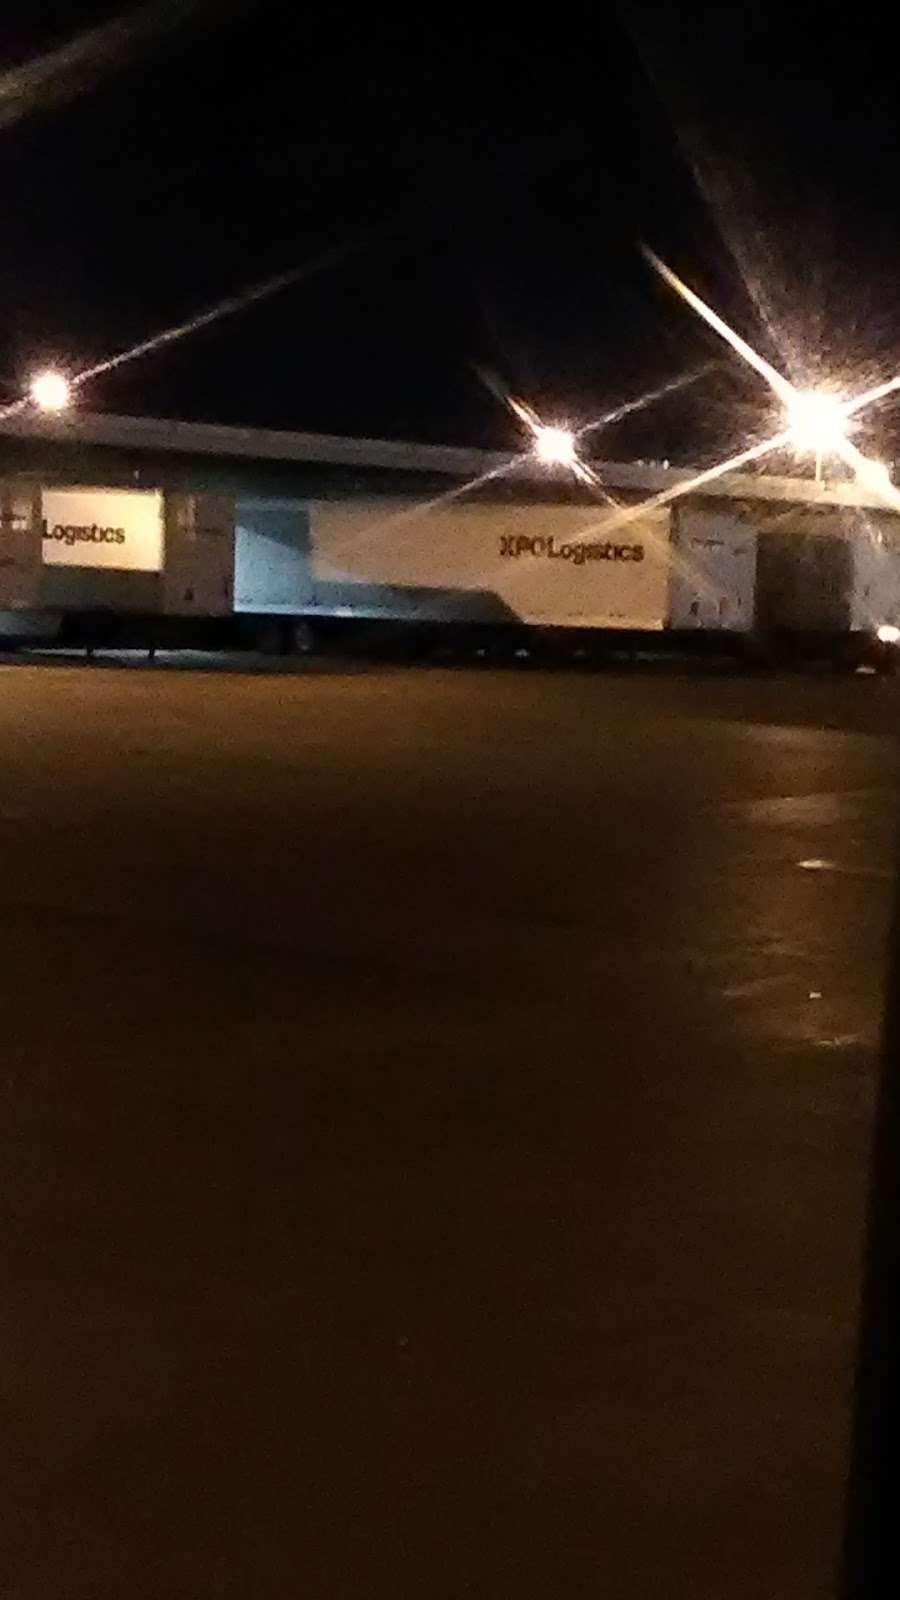 XPO Logistics - moving company  | Photo 7 of 10 | Address: 5020 Calvert St, Dallas, TX 75247, USA | Phone: (214) 631-5486